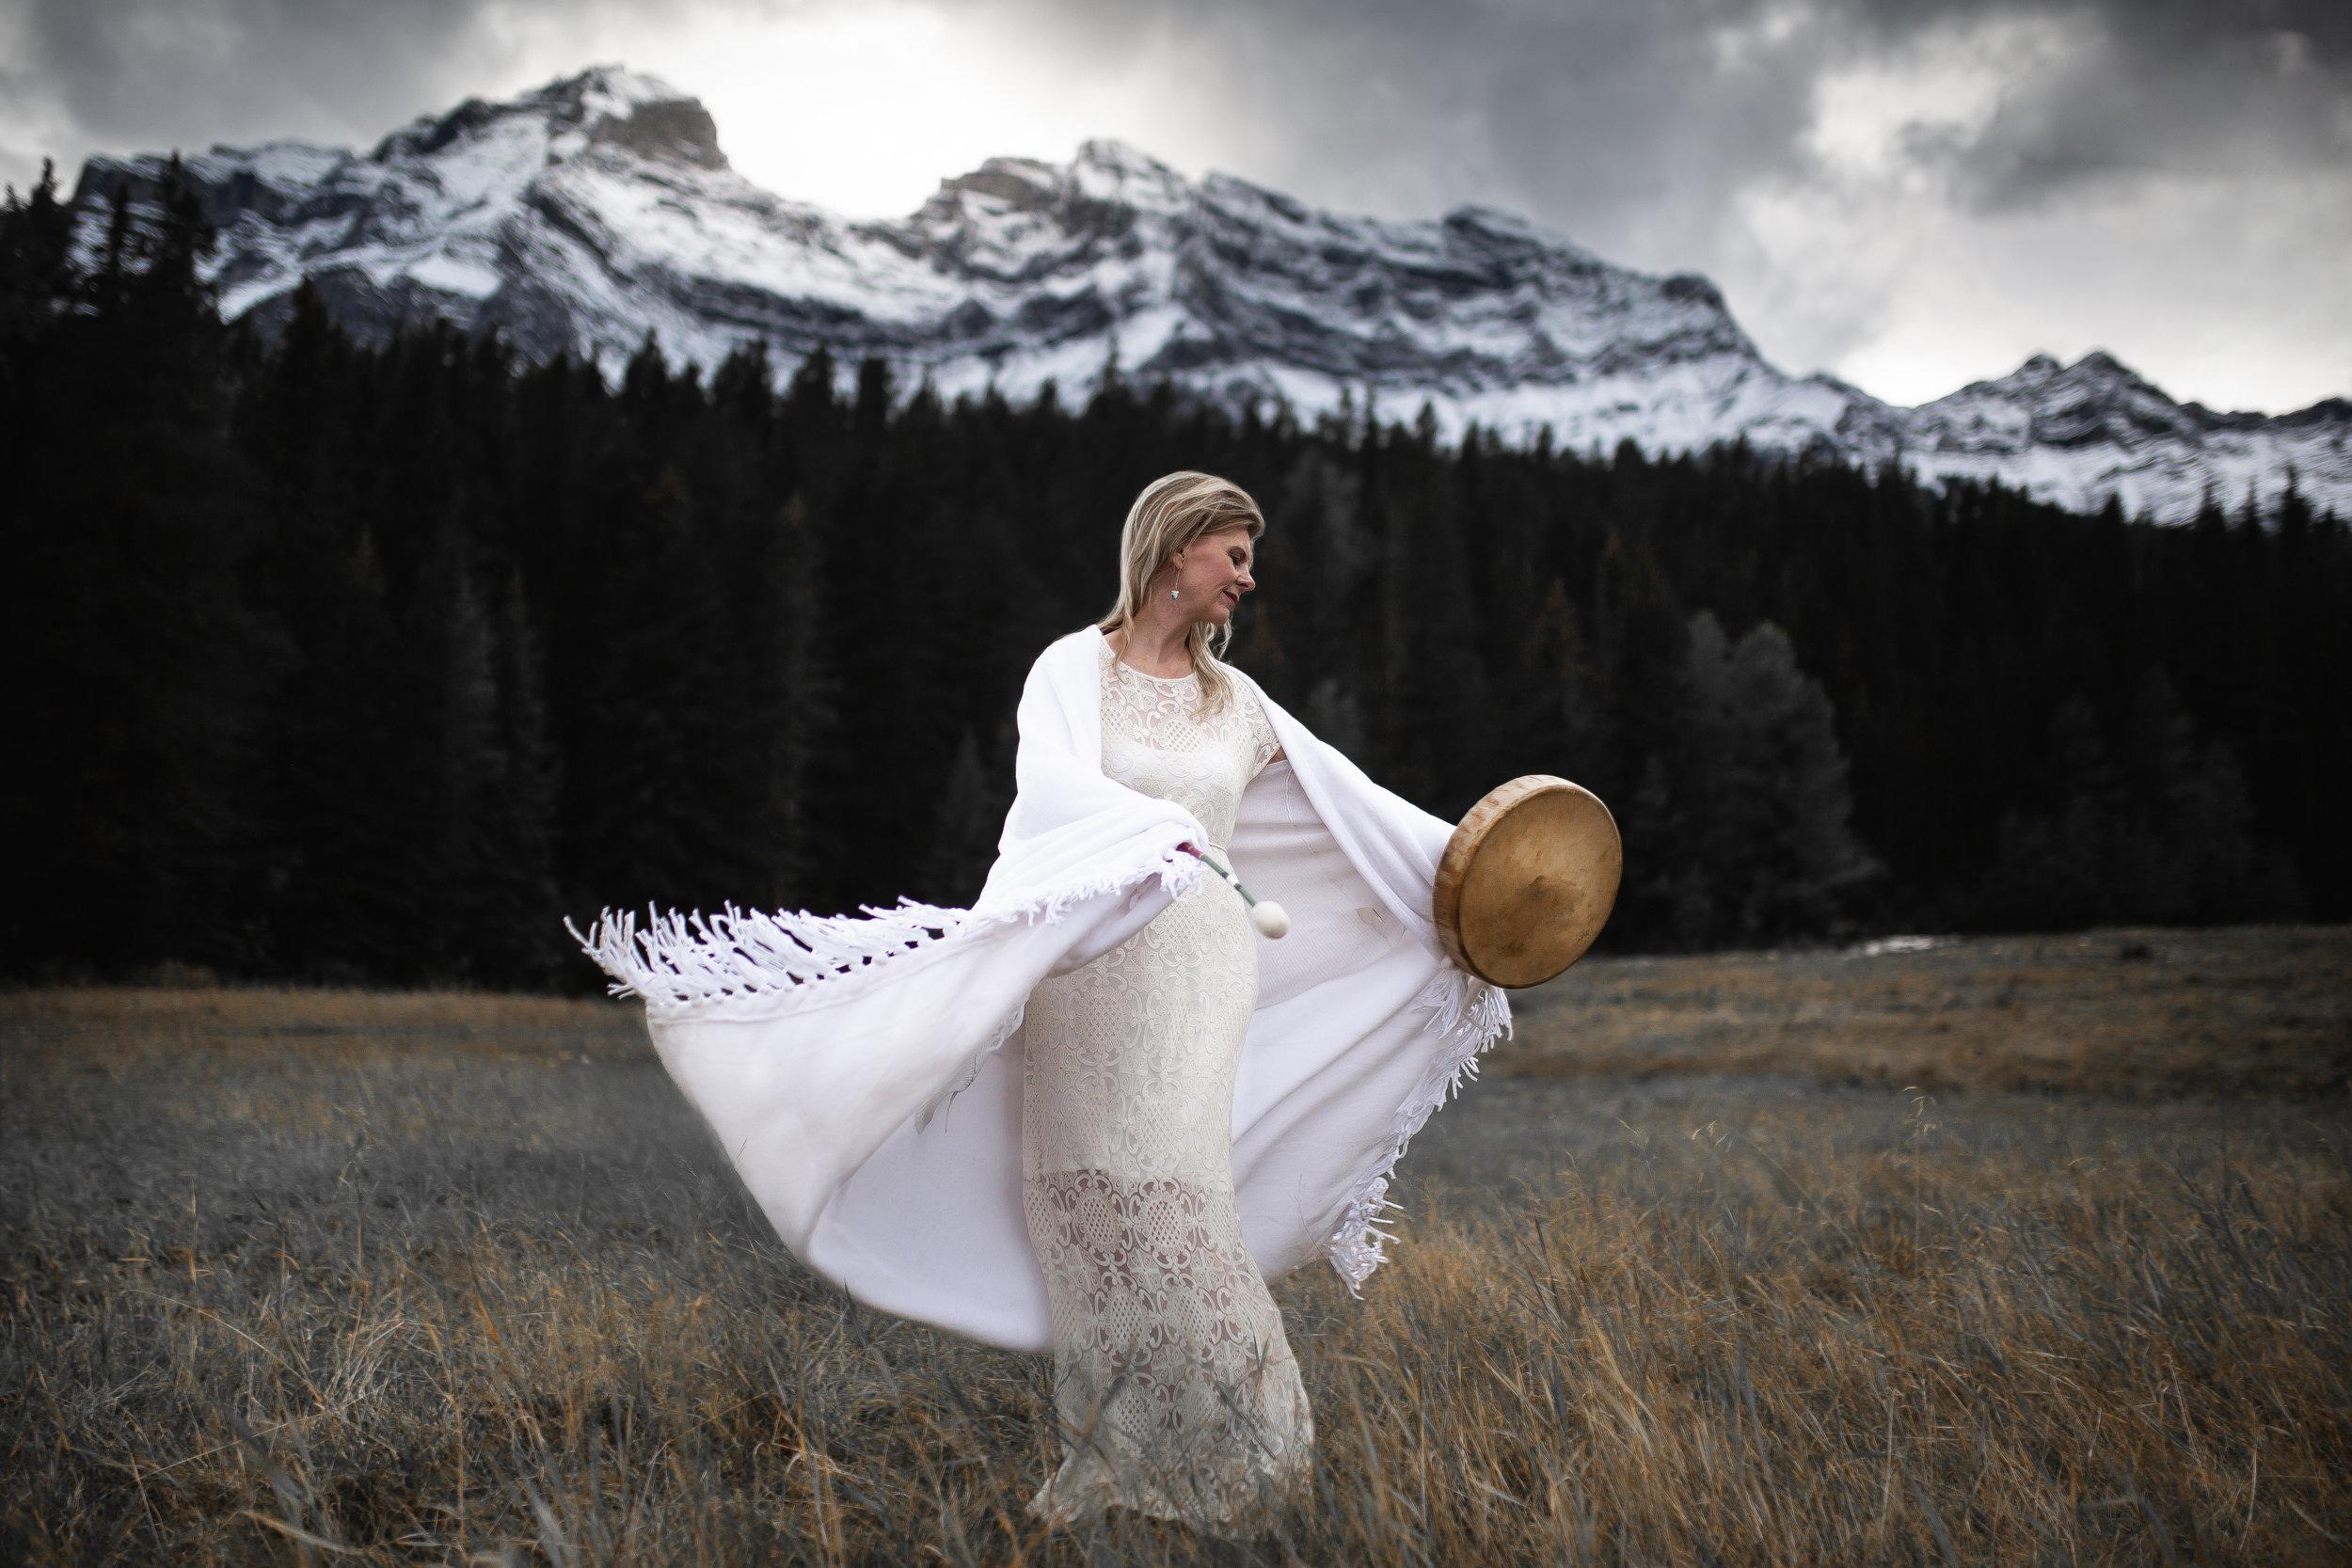 45AdamZiorioPhotography-SpiritHealerPhotographer-Catherine.jpg